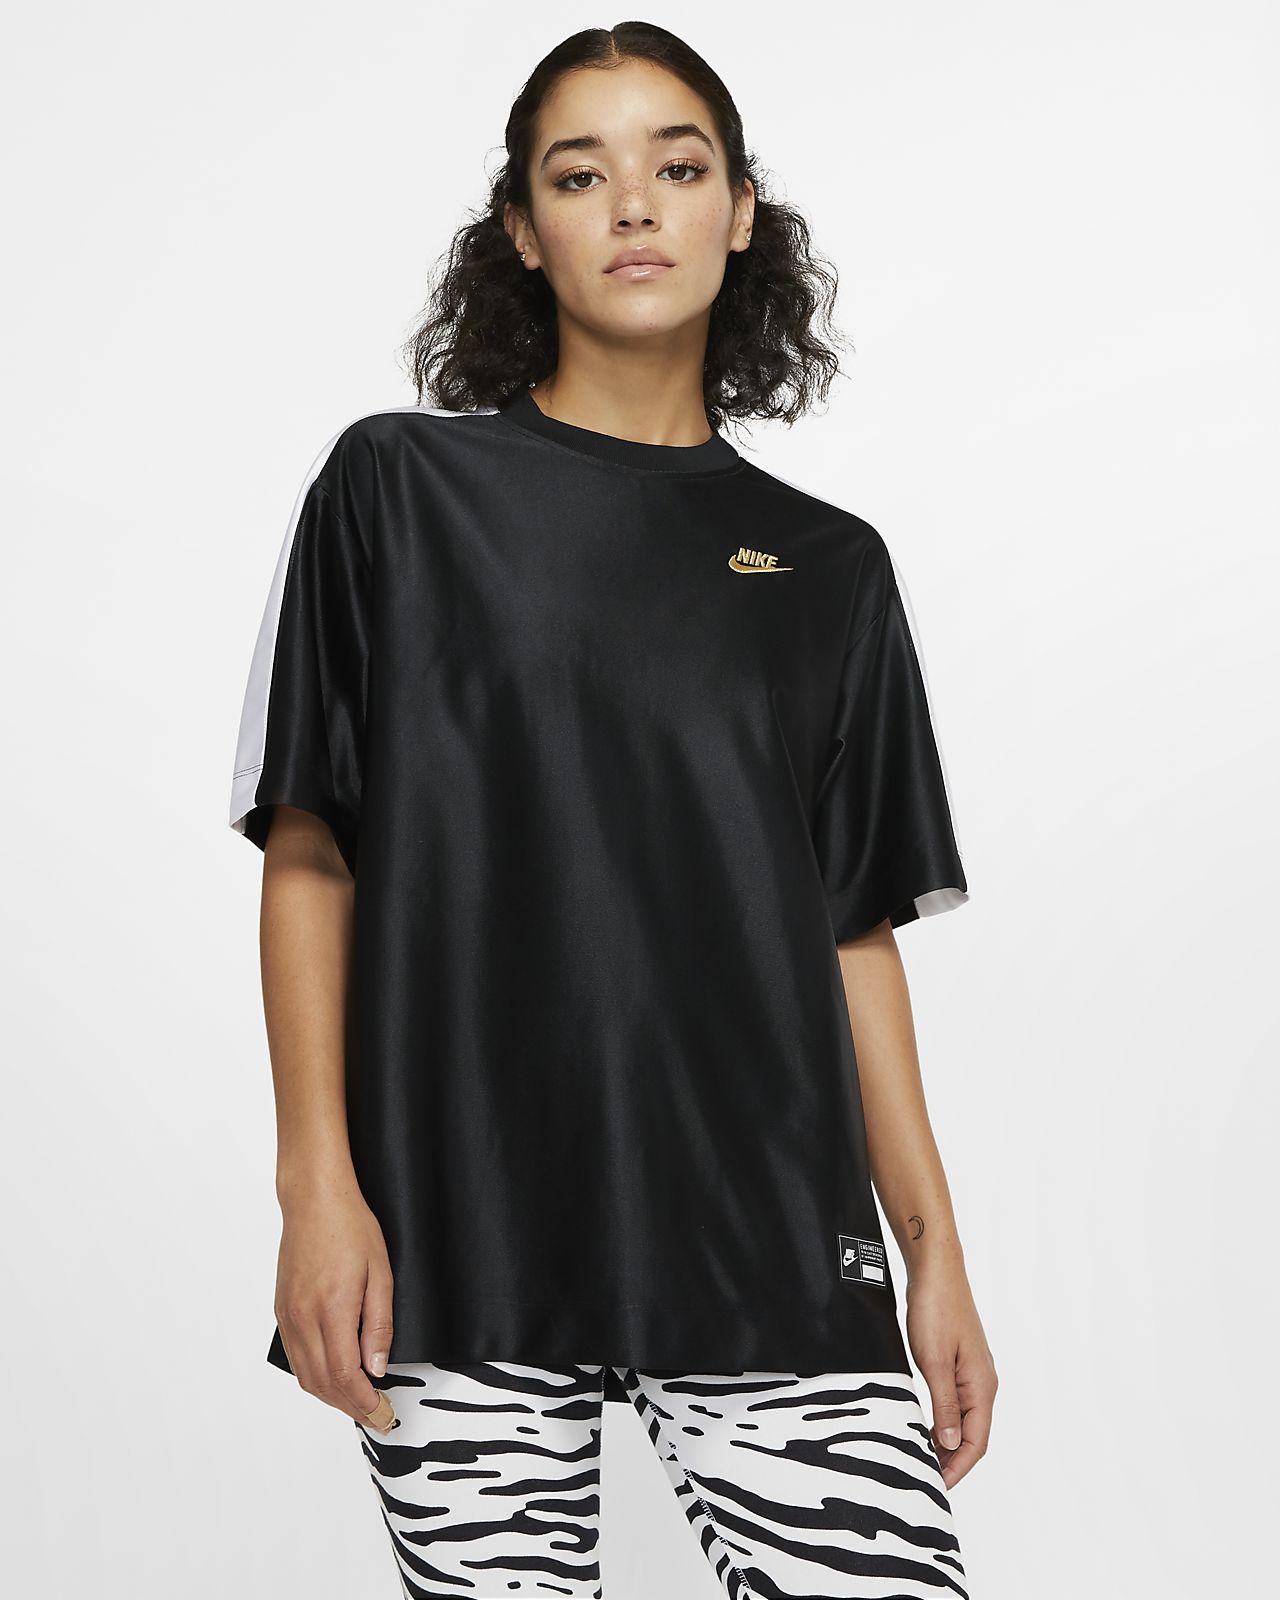 Prenda para la parte superior de manga corta para mujer Nike Sportswear Icon Clash